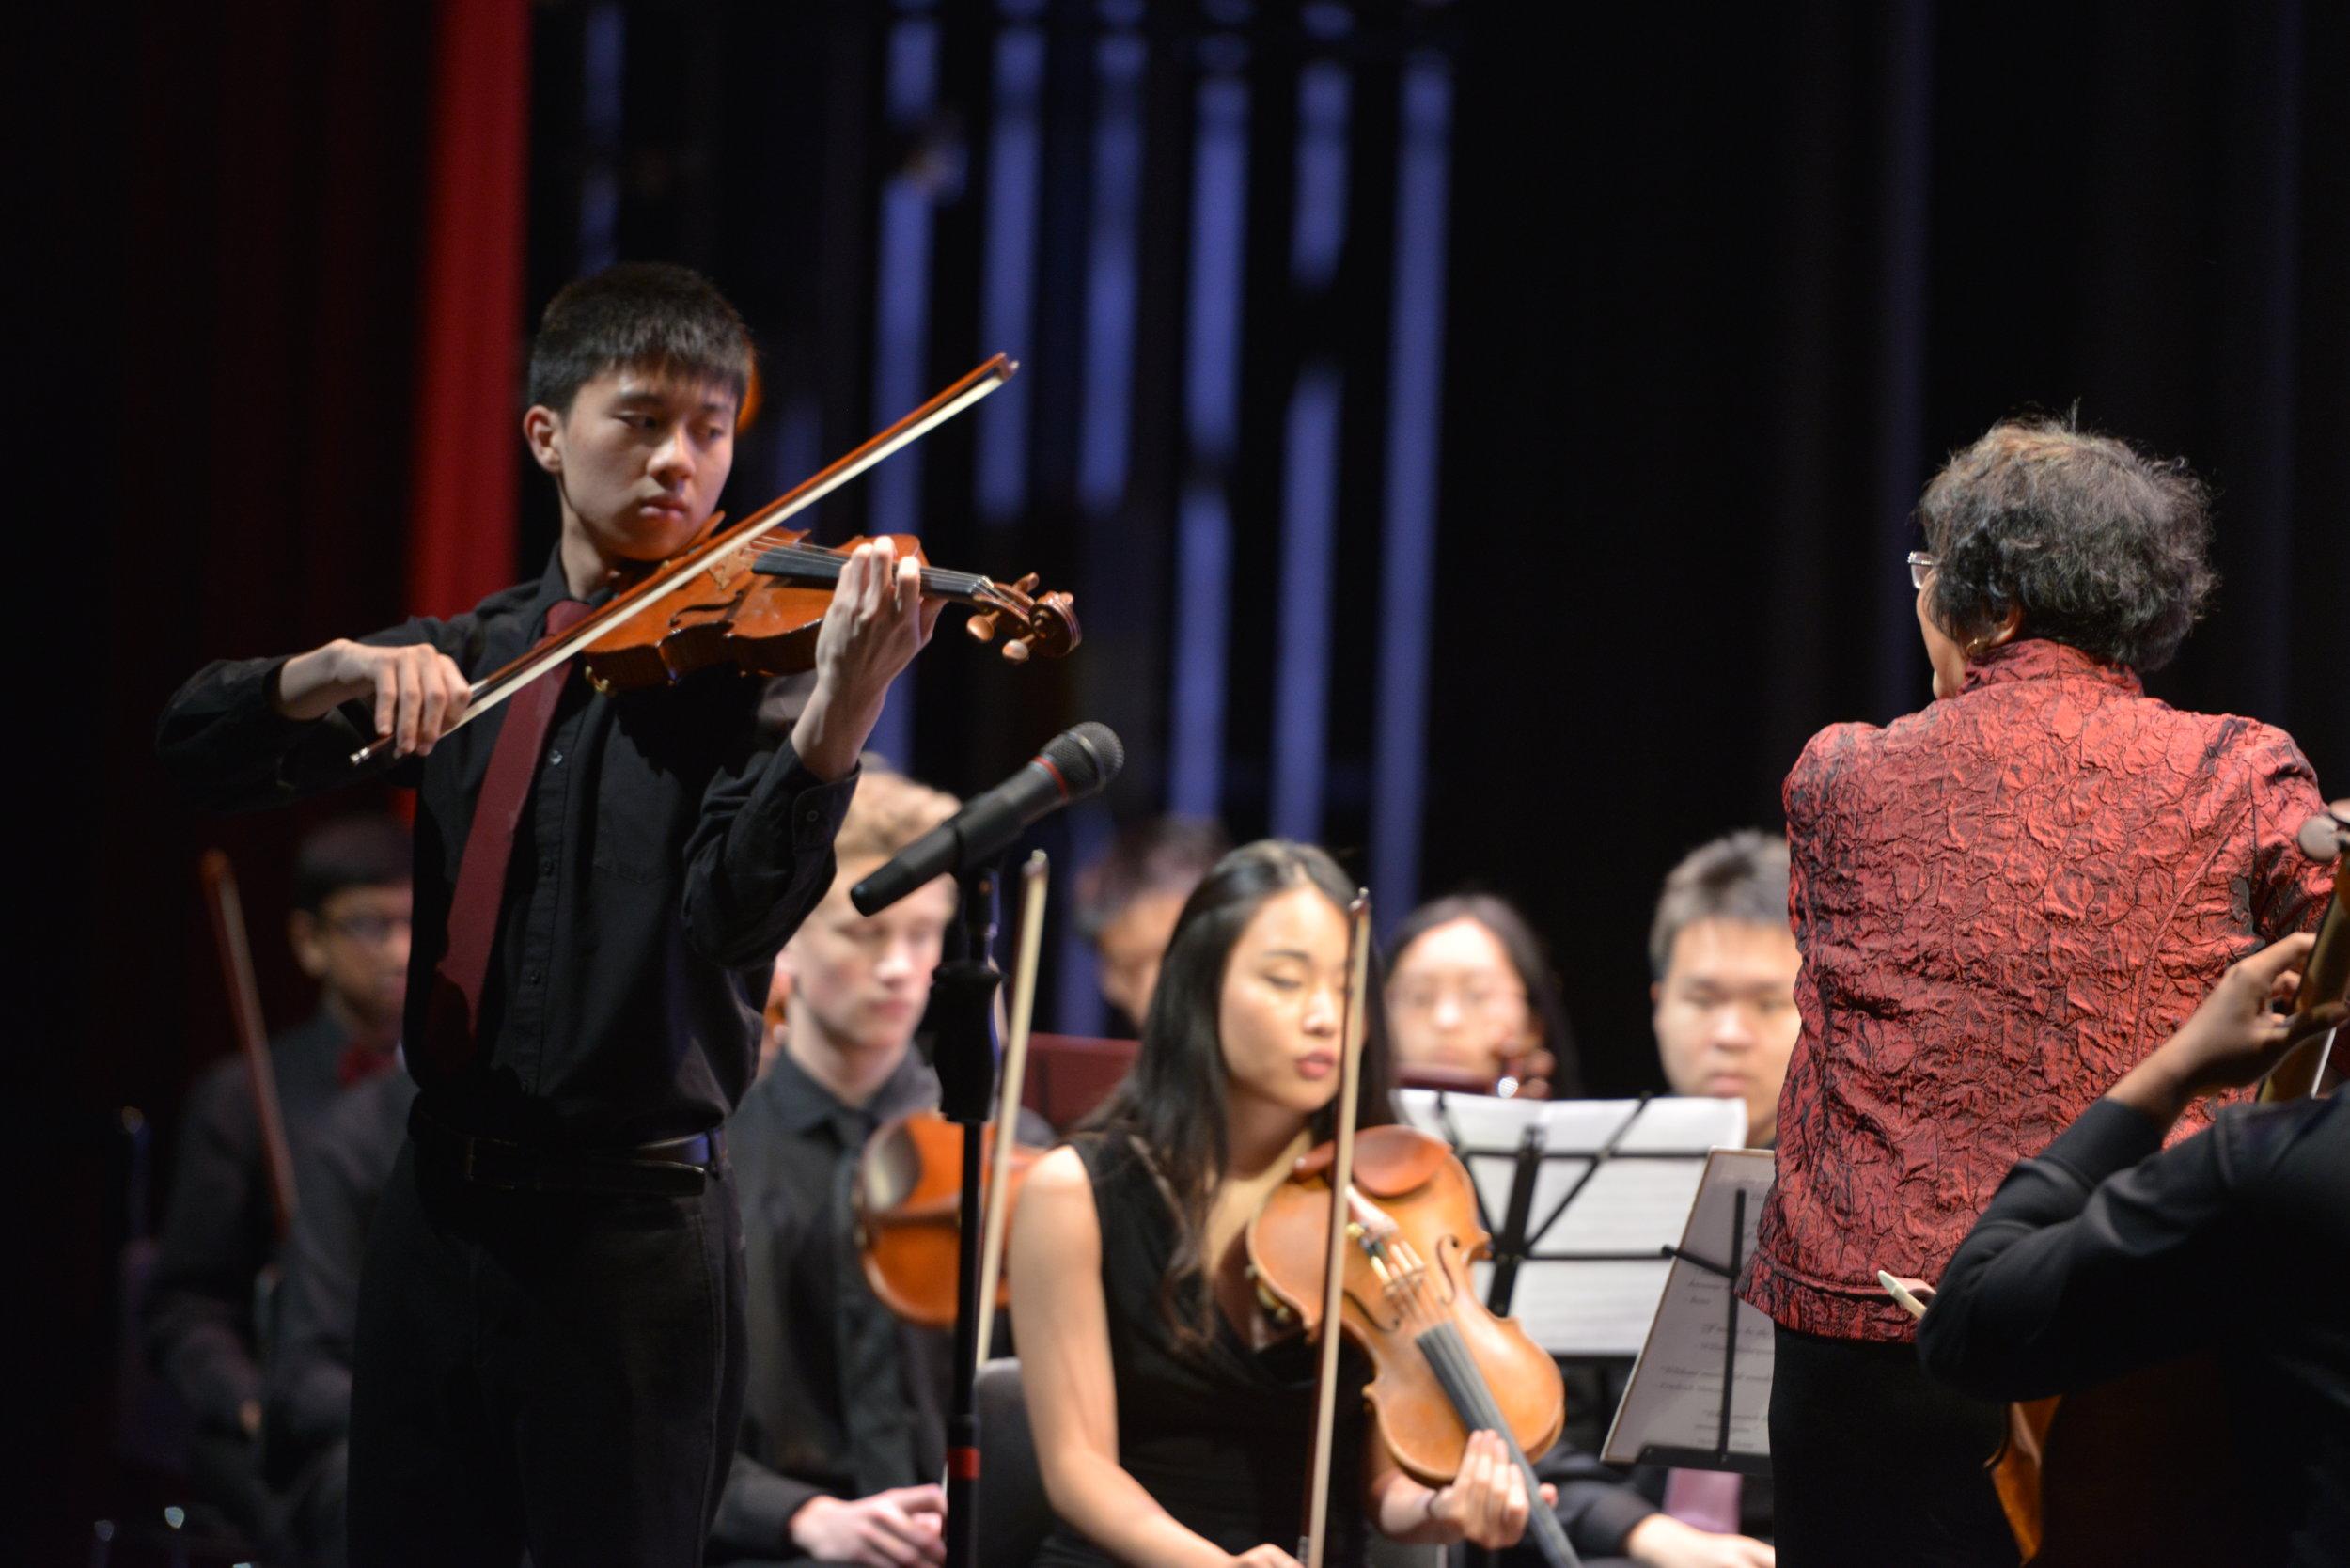 Soloist Michael Li performing the Dvorak Romance in F minor